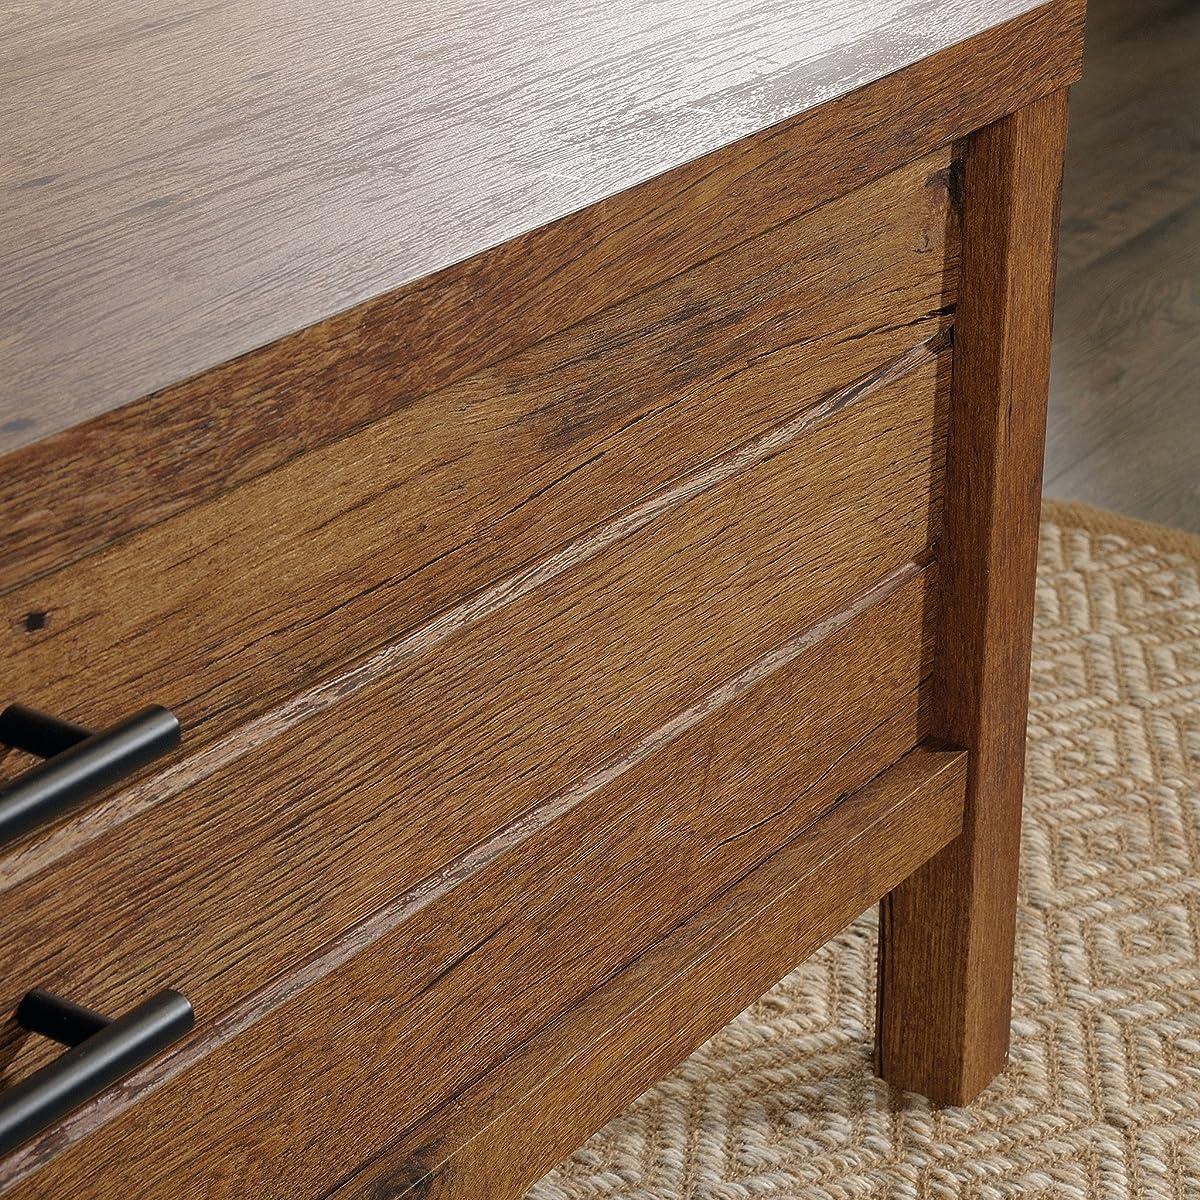 Sauder 420233 New Grange Coffee Table, Vintage Oak